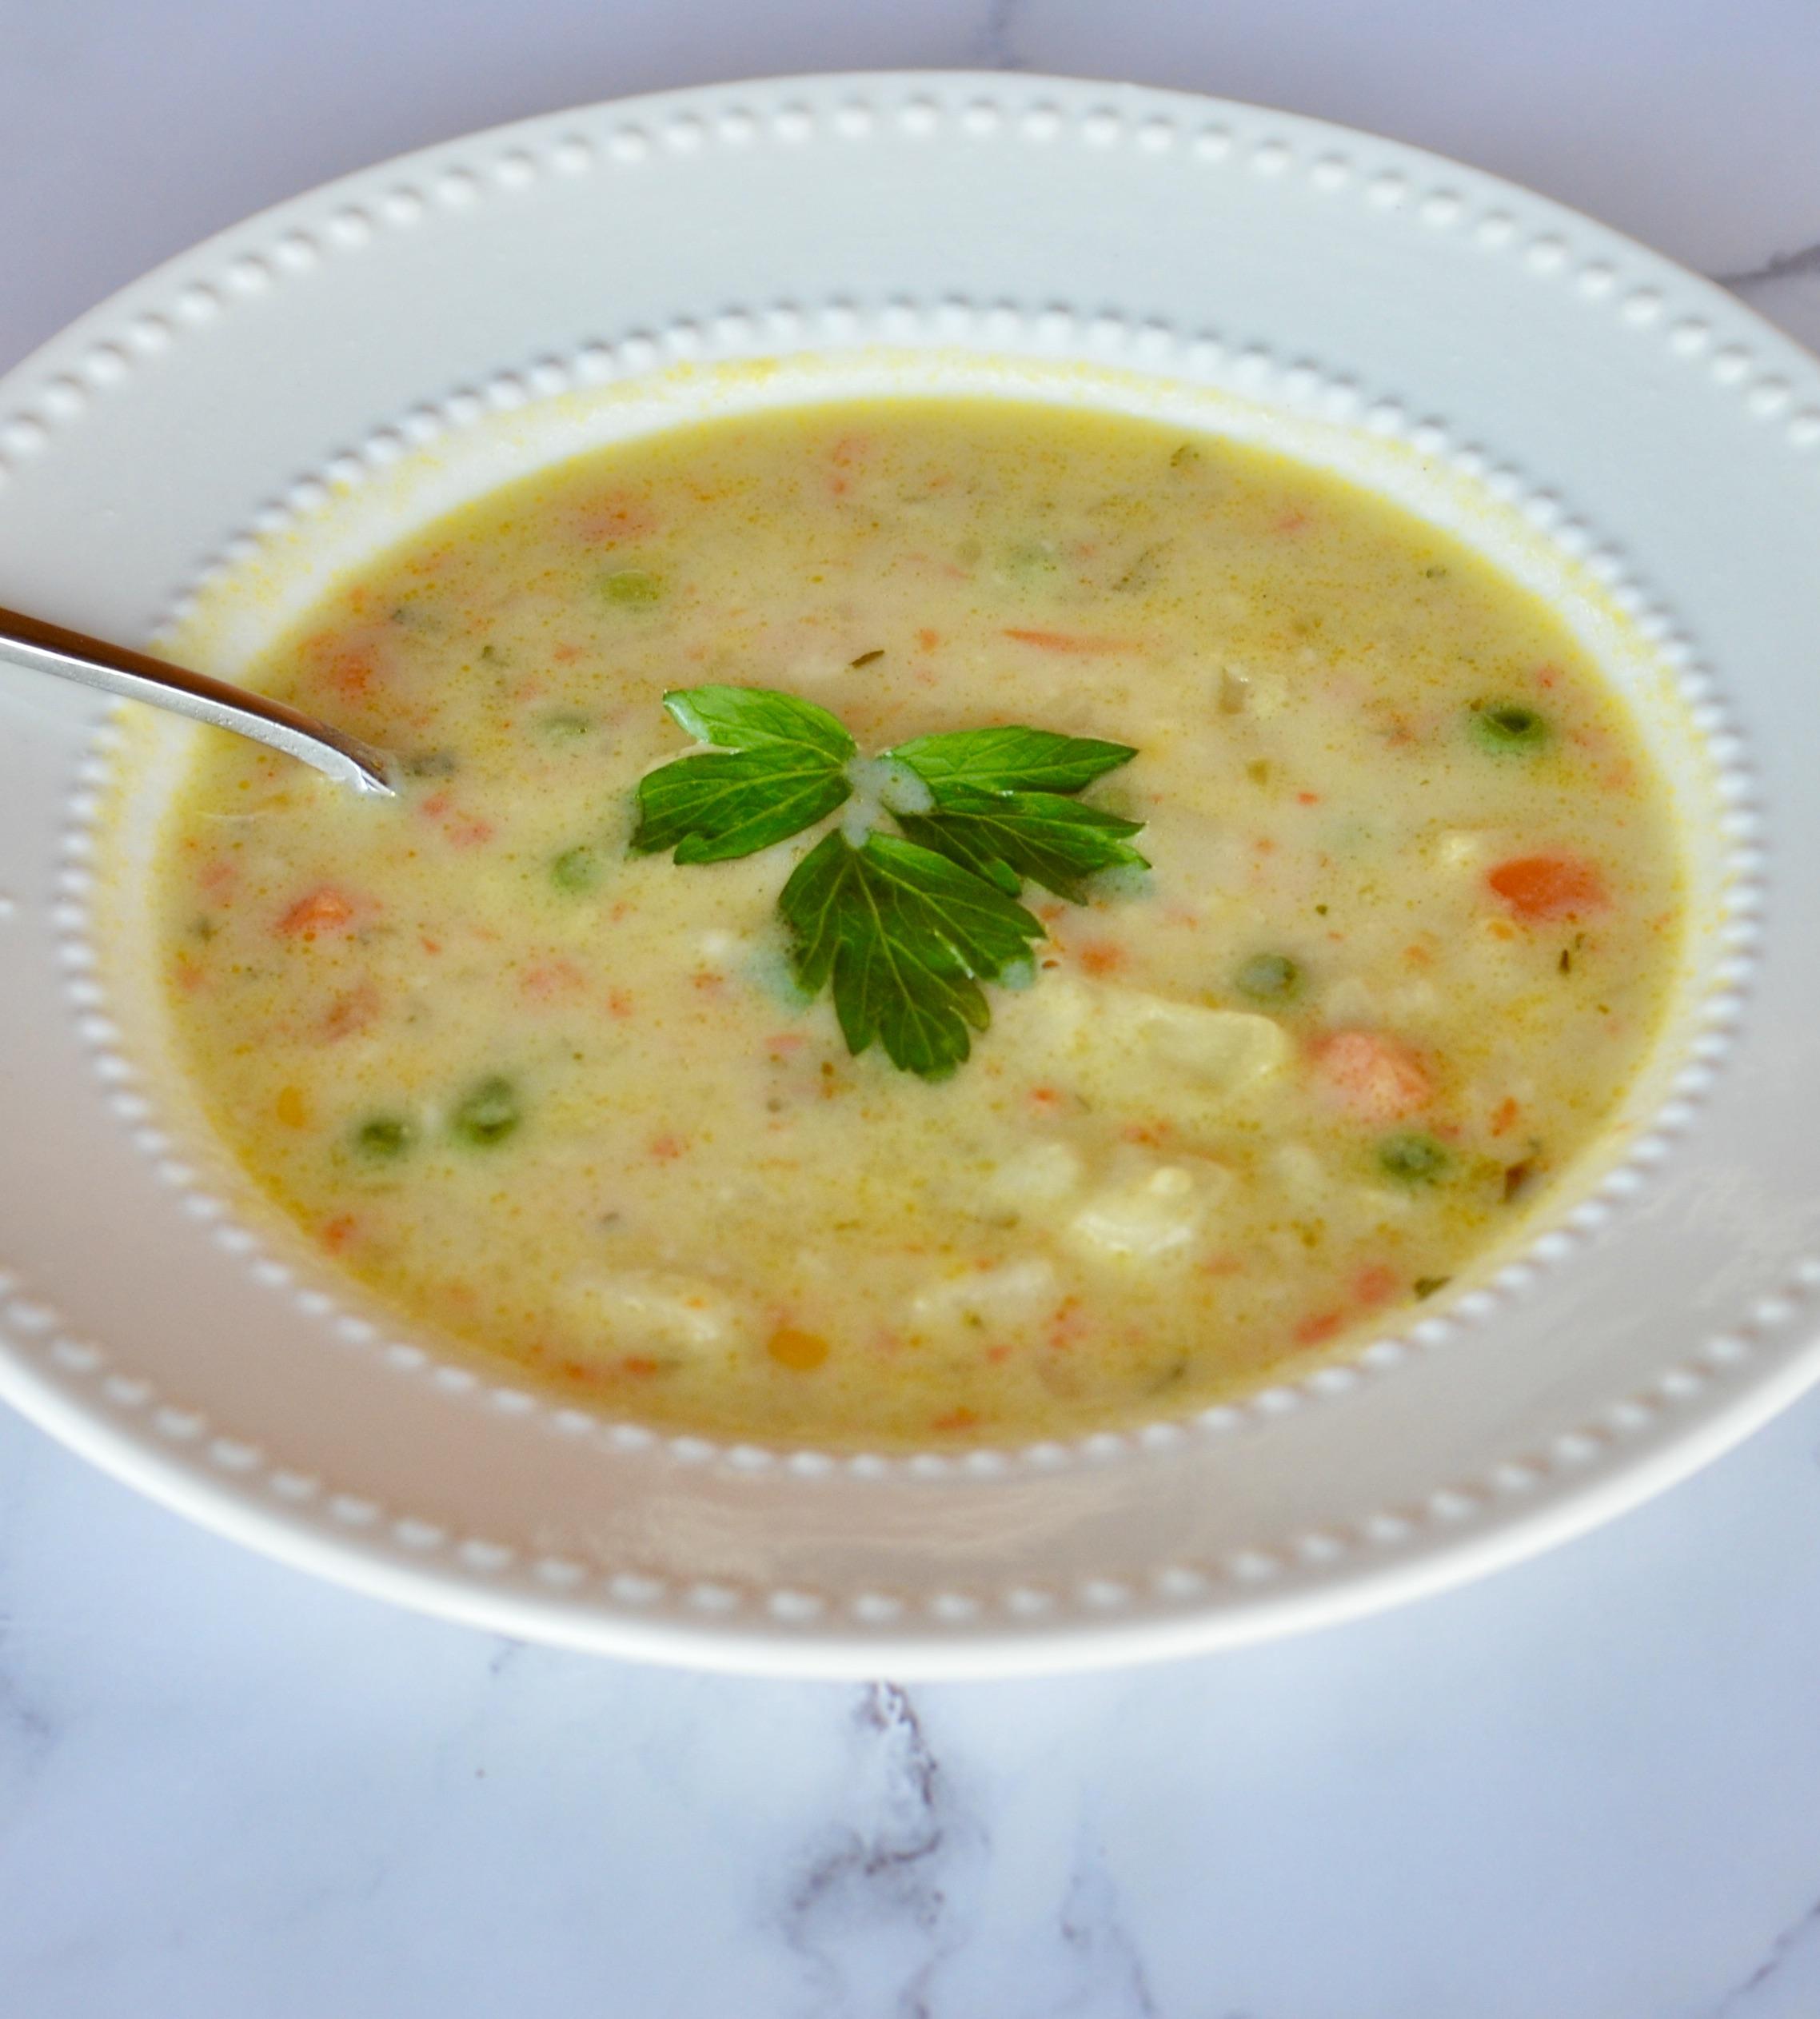 Ian's Potato-Vegetable Soup